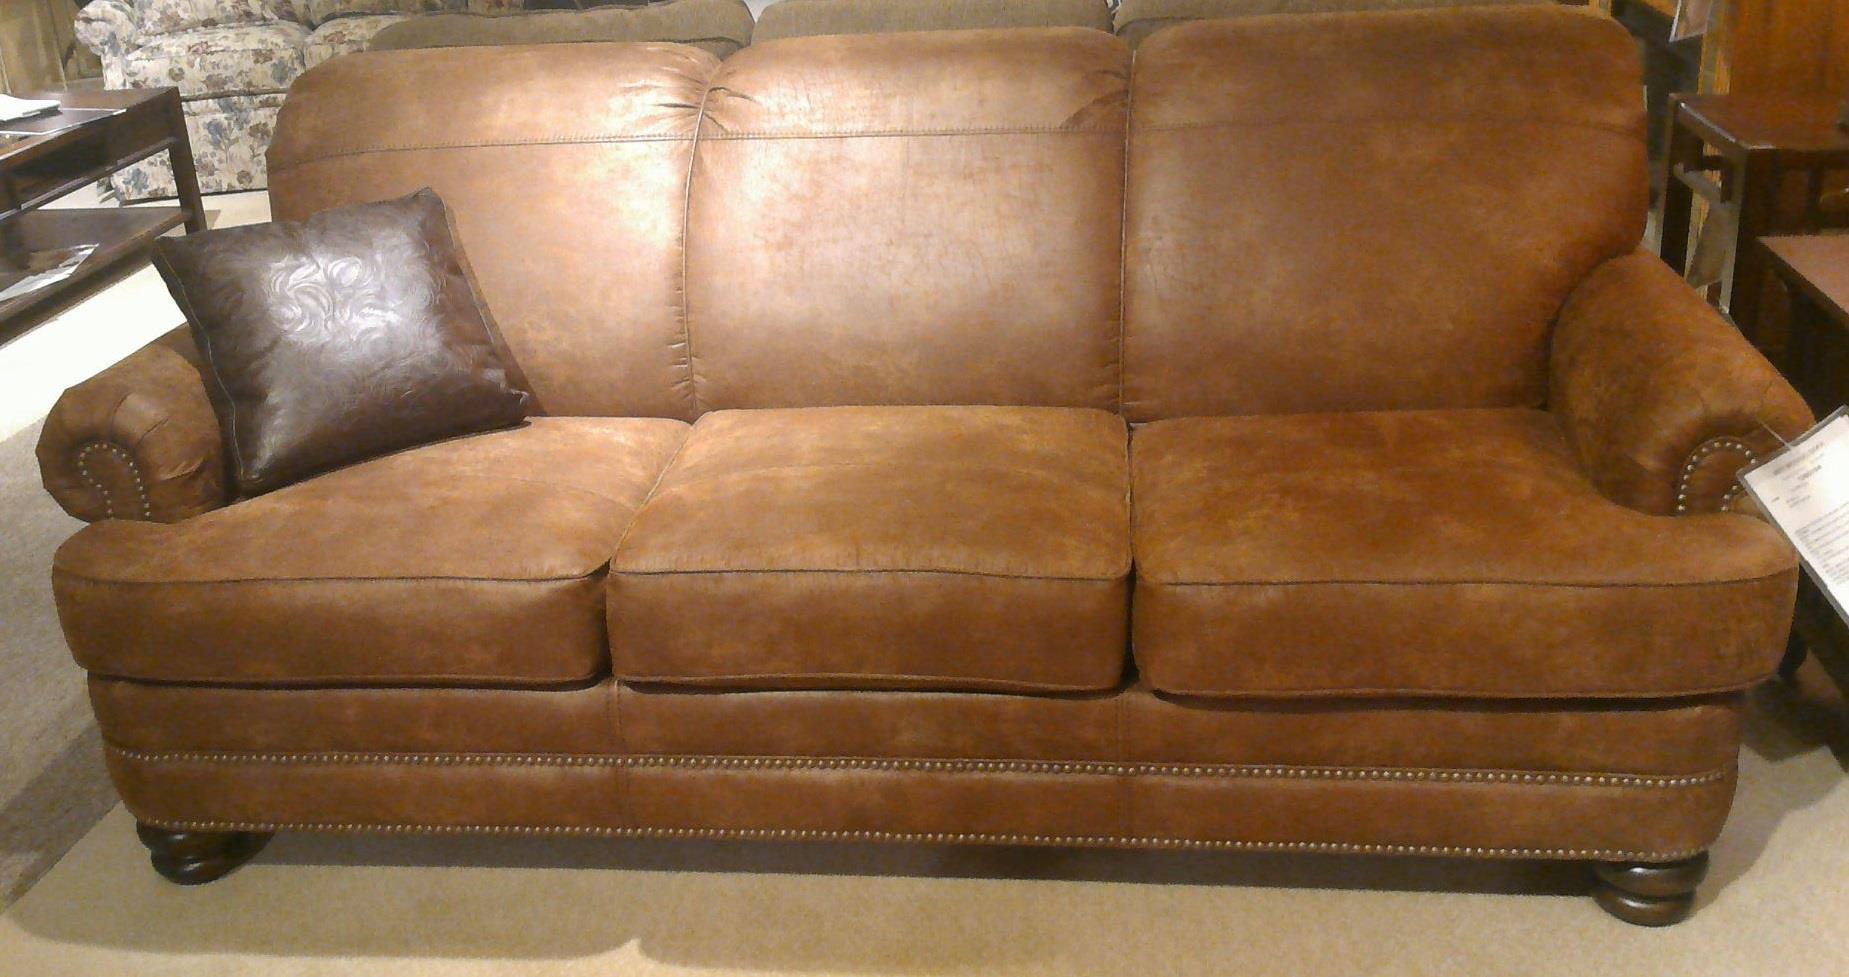 bay sofa overstuffed sofas canada flexsteel bridge n7791 31 traditional rolled back dunk